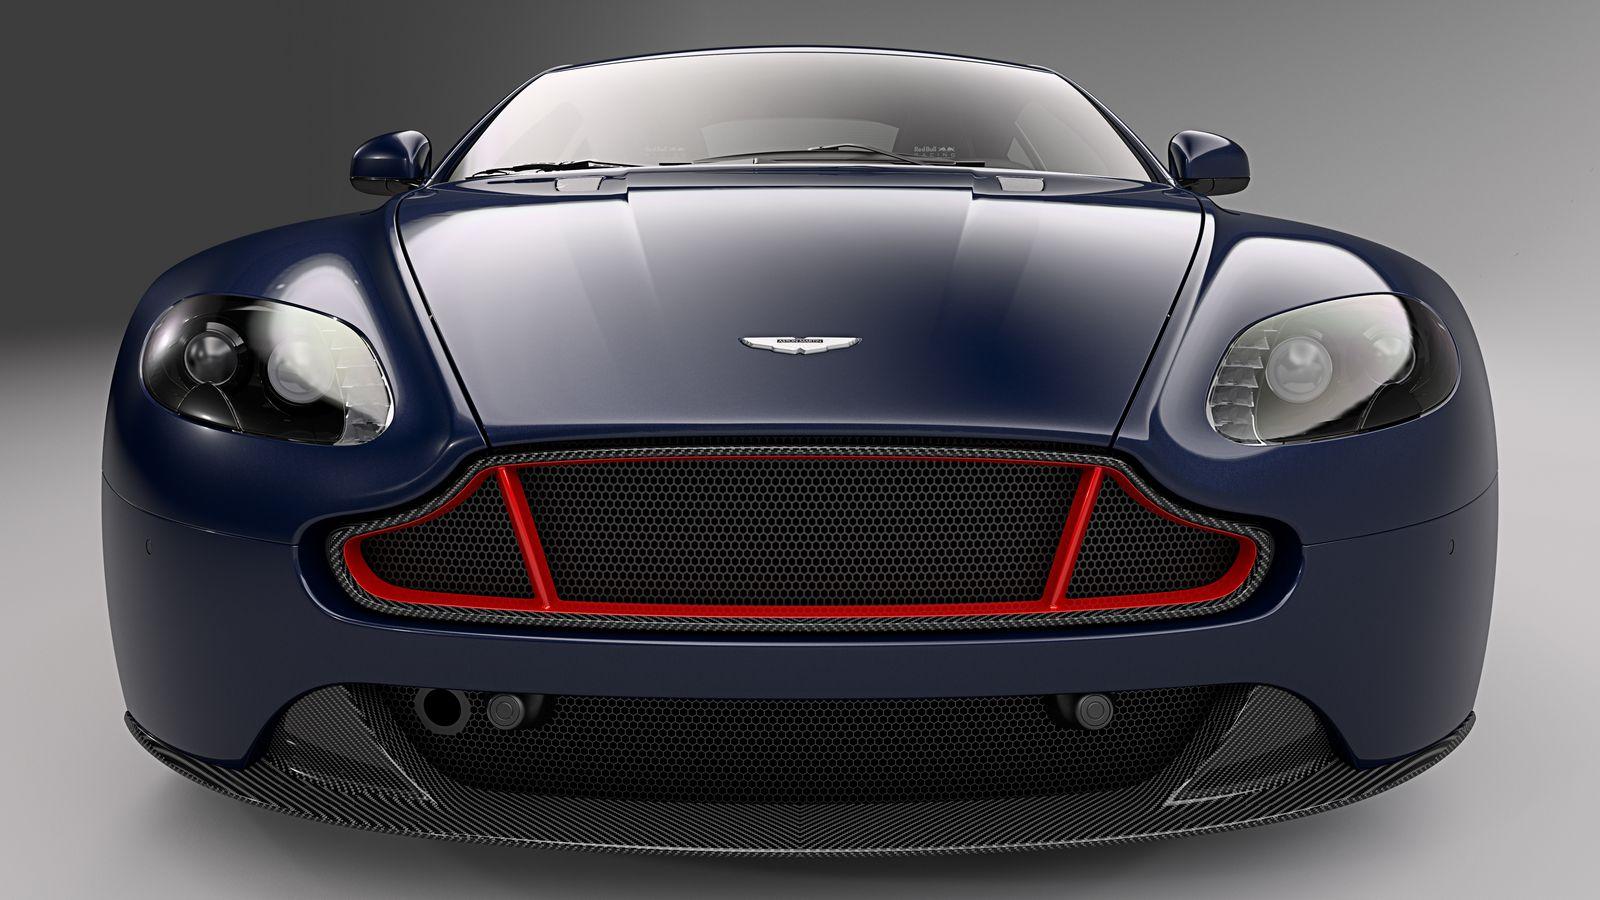 Aston Martin V8 and V12 Vantage Red Bull Racing Editions (9)